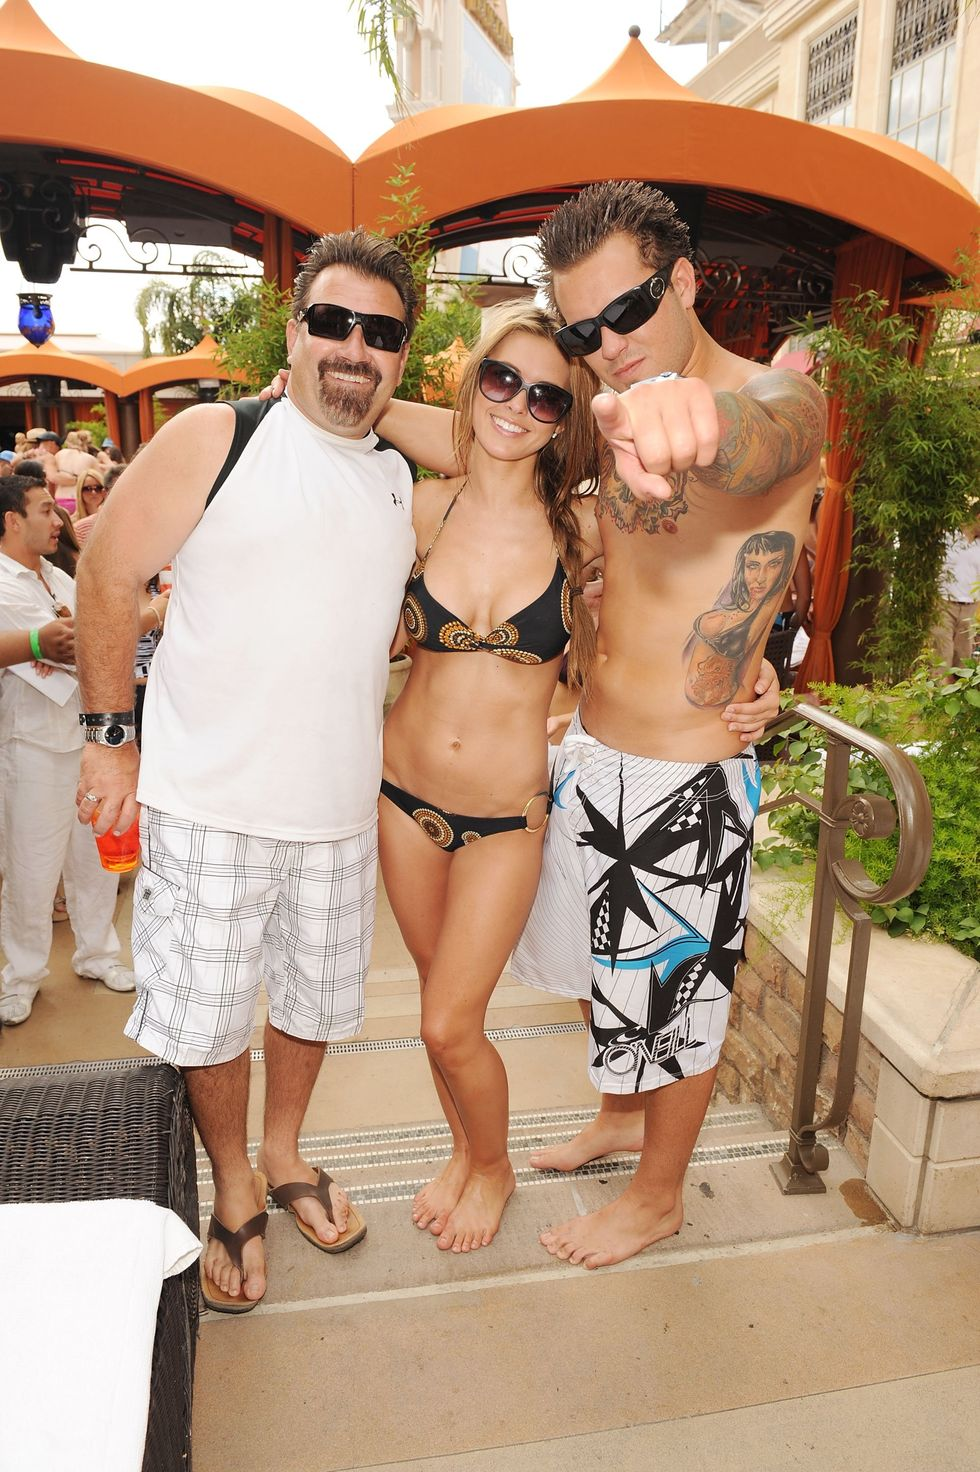 audrina-patridge-in-bikini-at-tao-beach-in-las-vegas-07